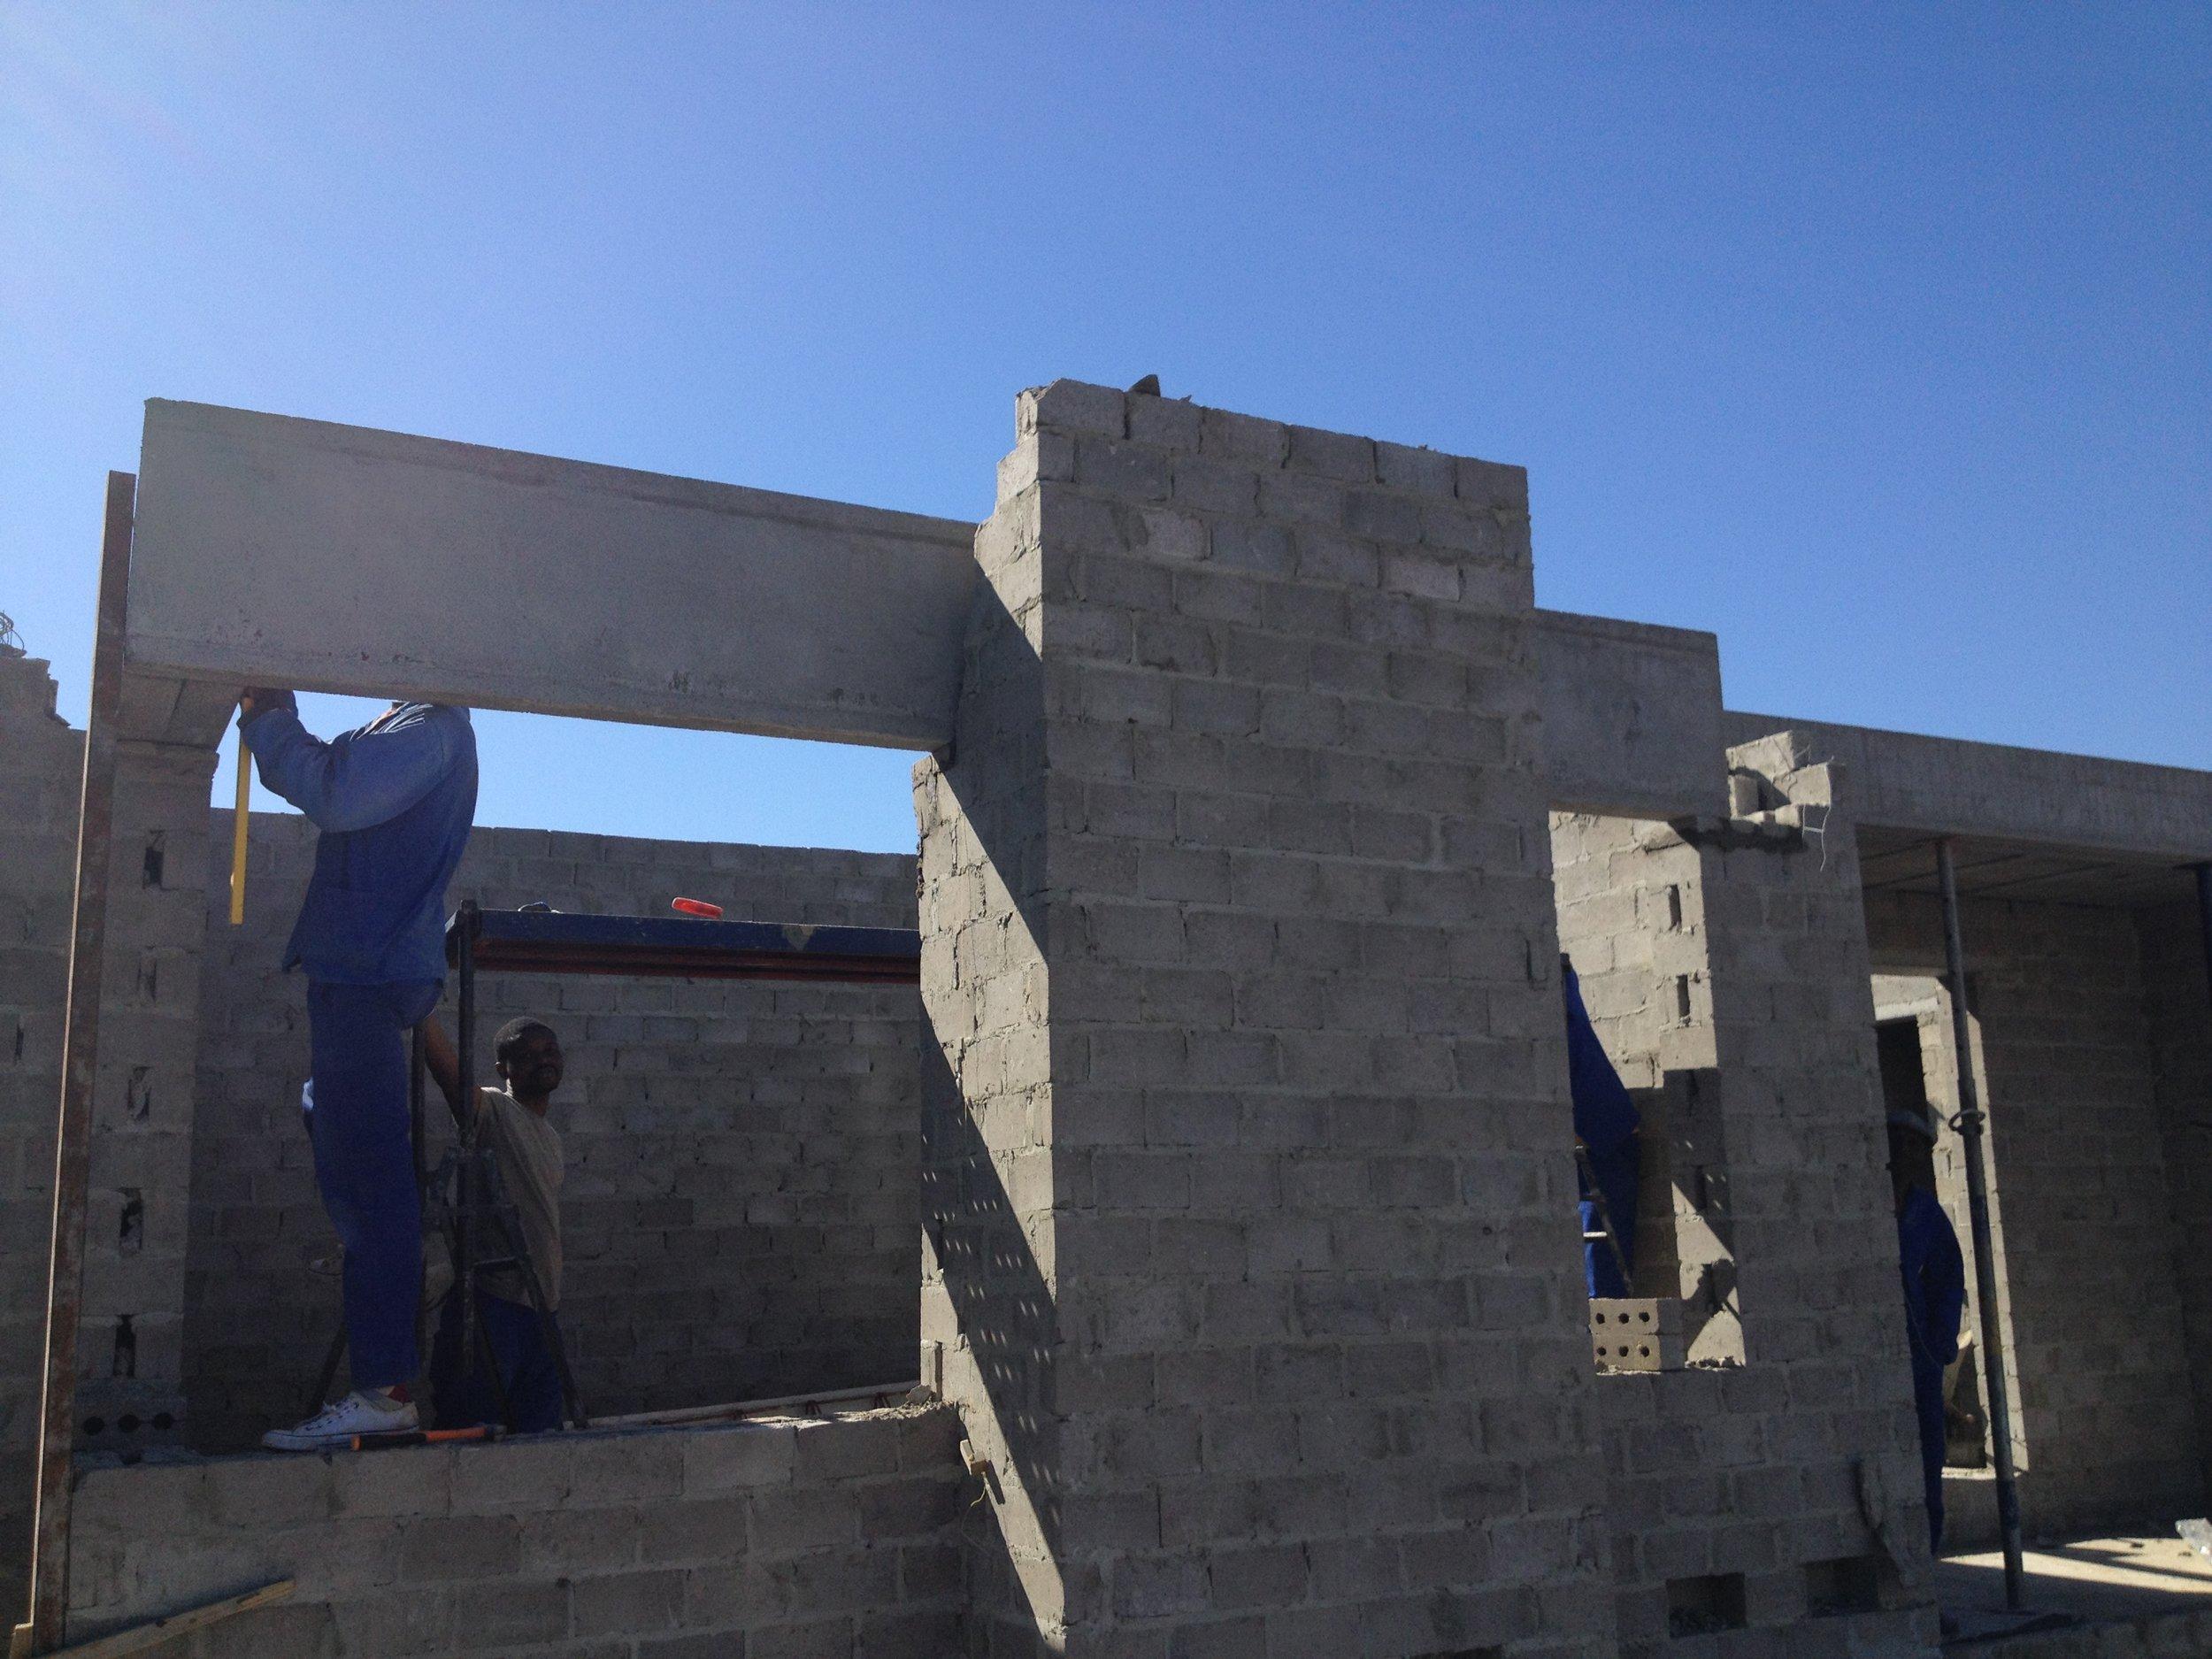 Eaves beam installation